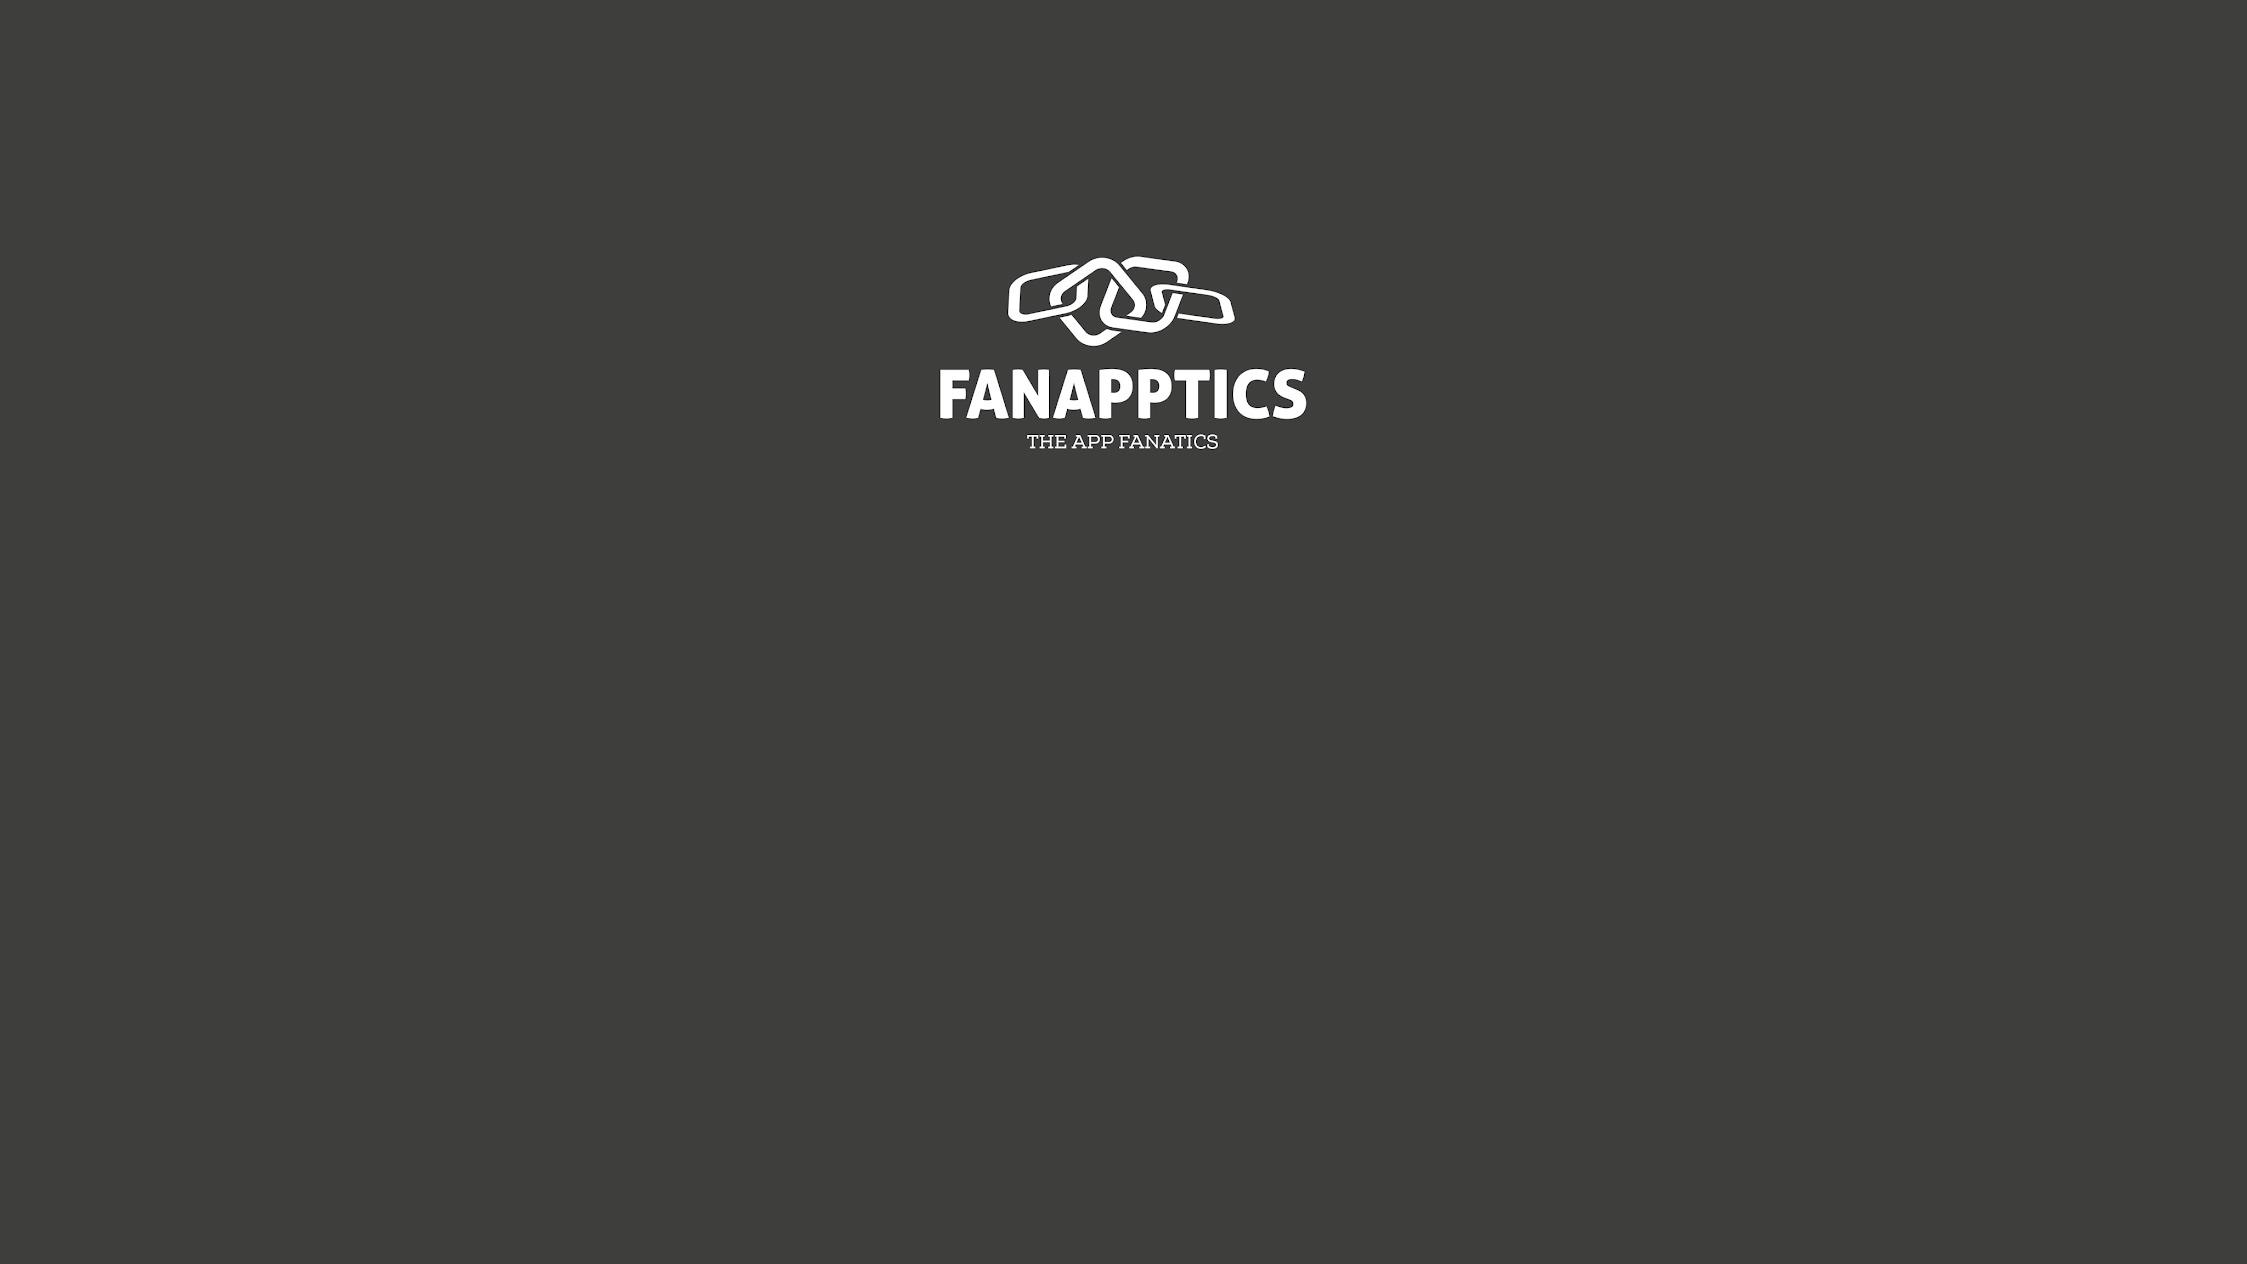 fanapptics UG